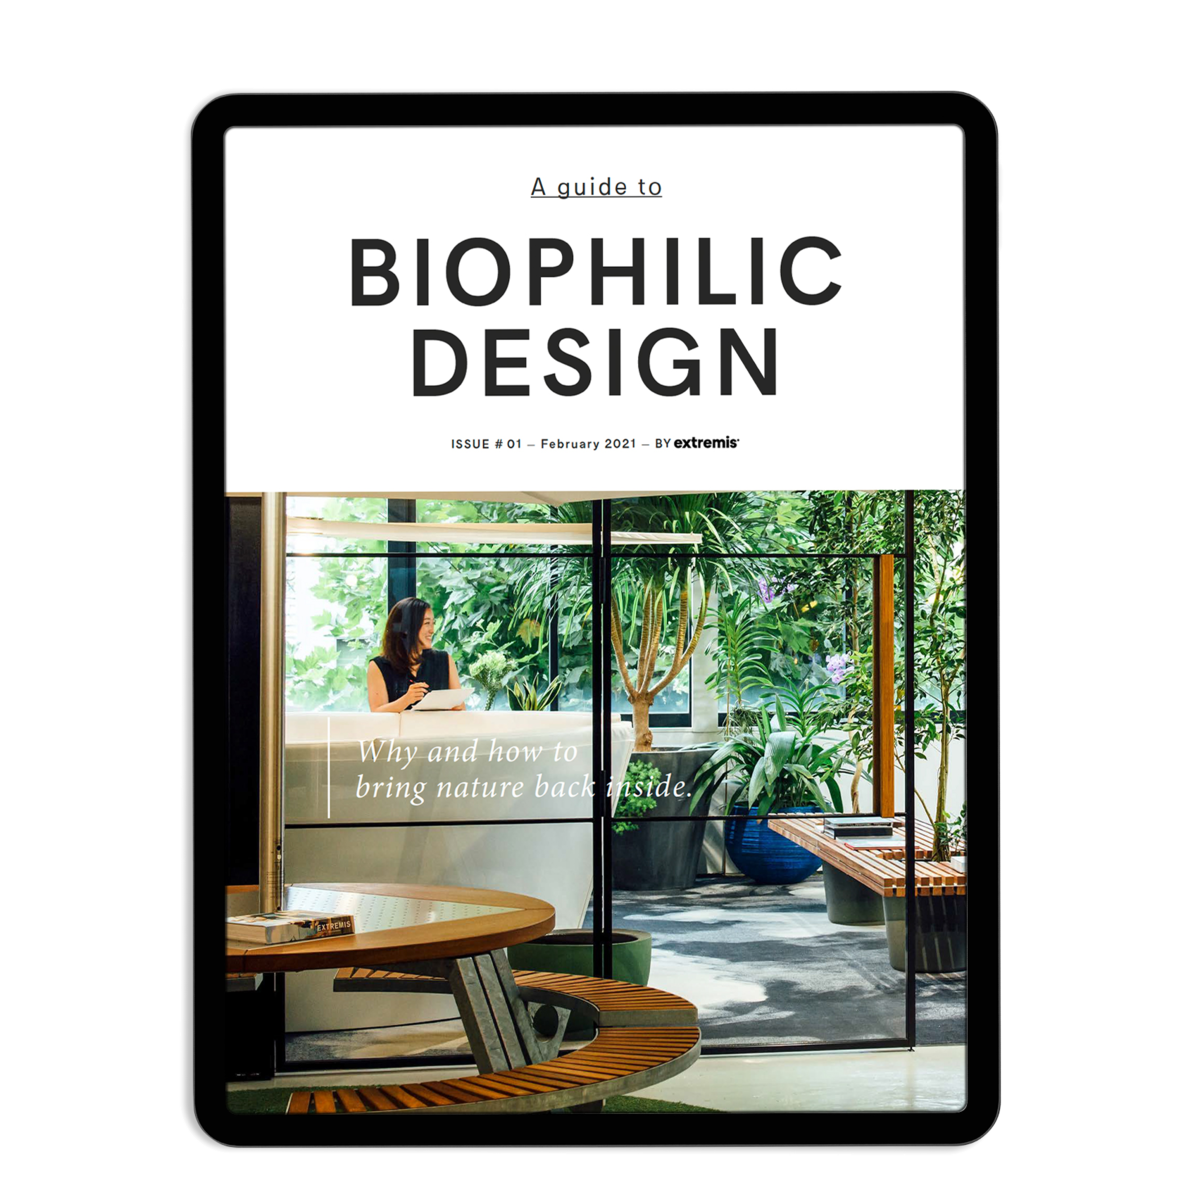 A guide to biophilic design